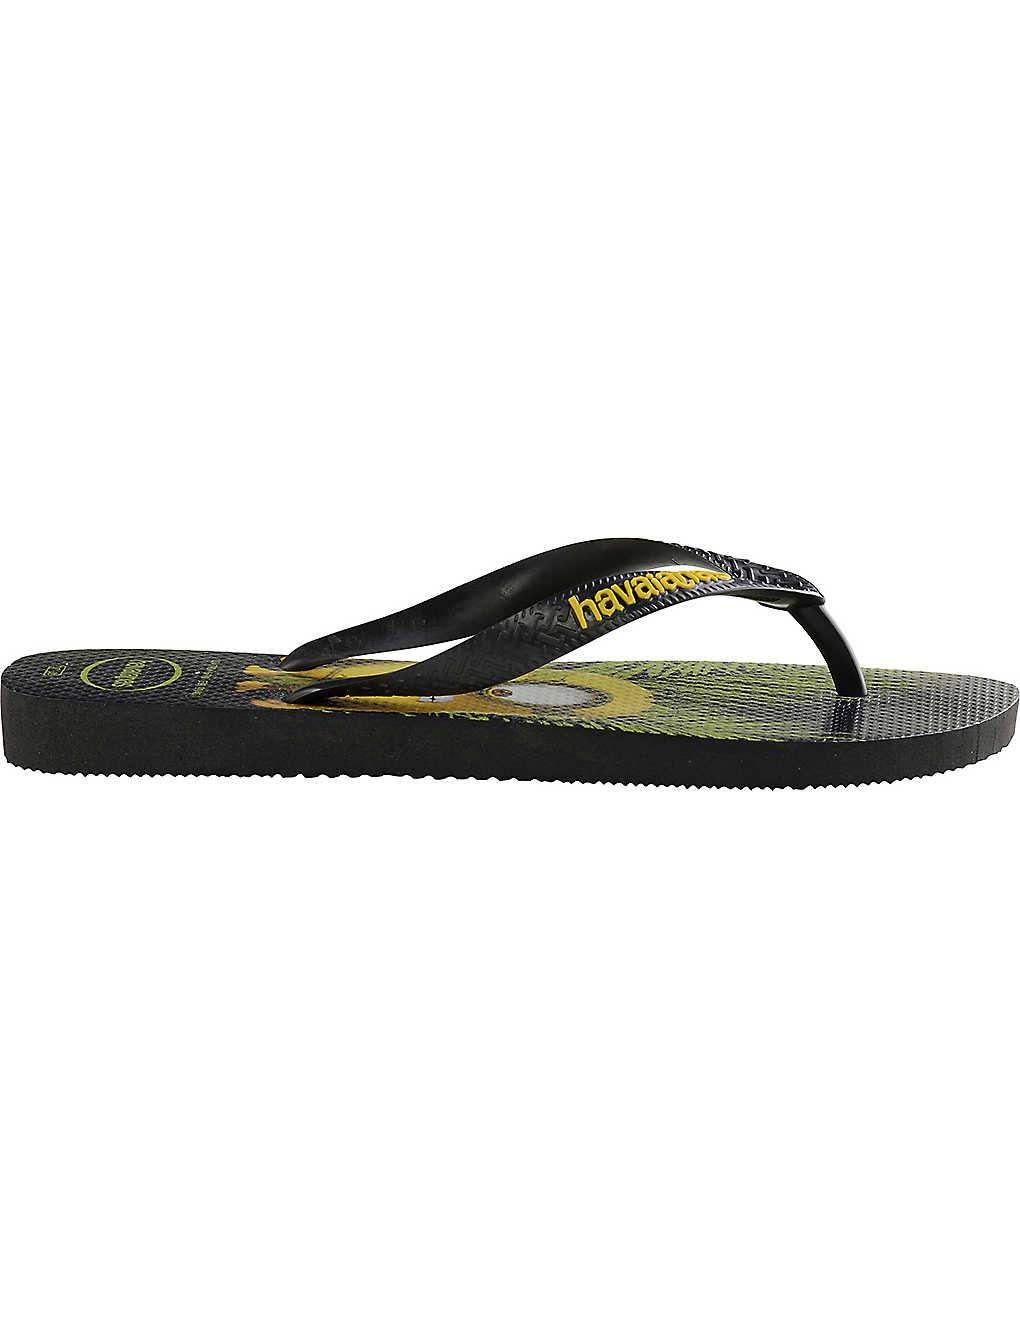 18e9220e3bf445 HAVAIANAS - Minions flip-flops